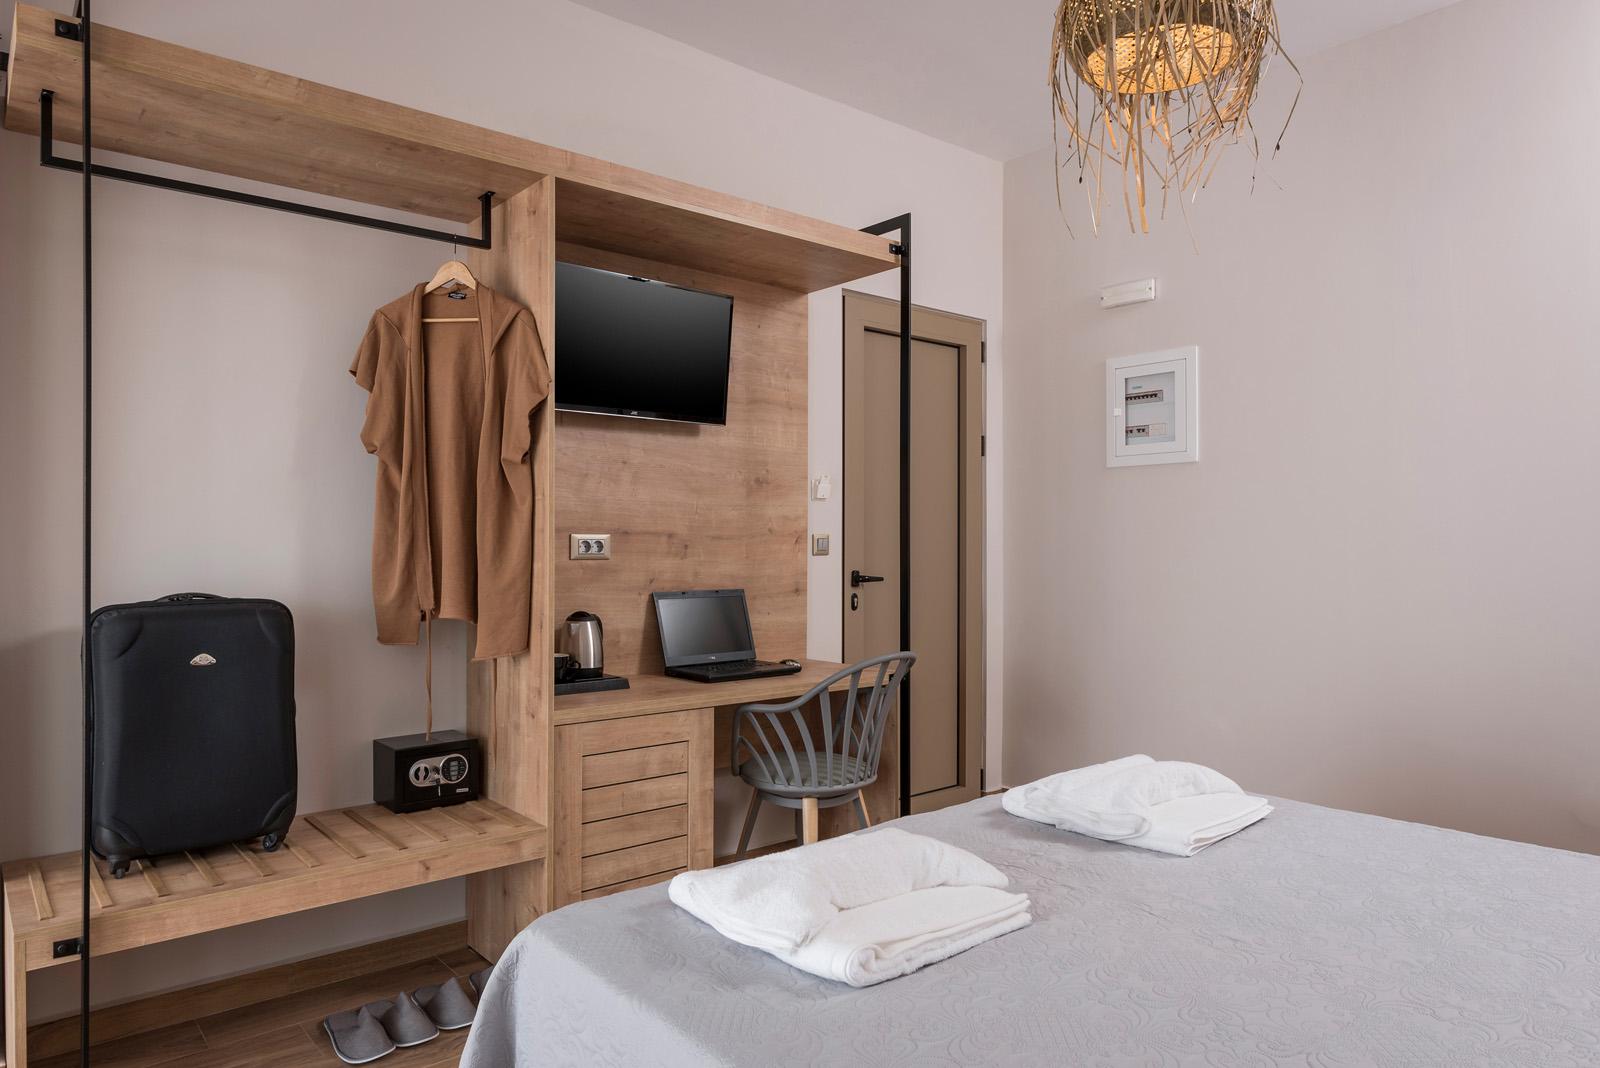 Aequor Luxury Rooms